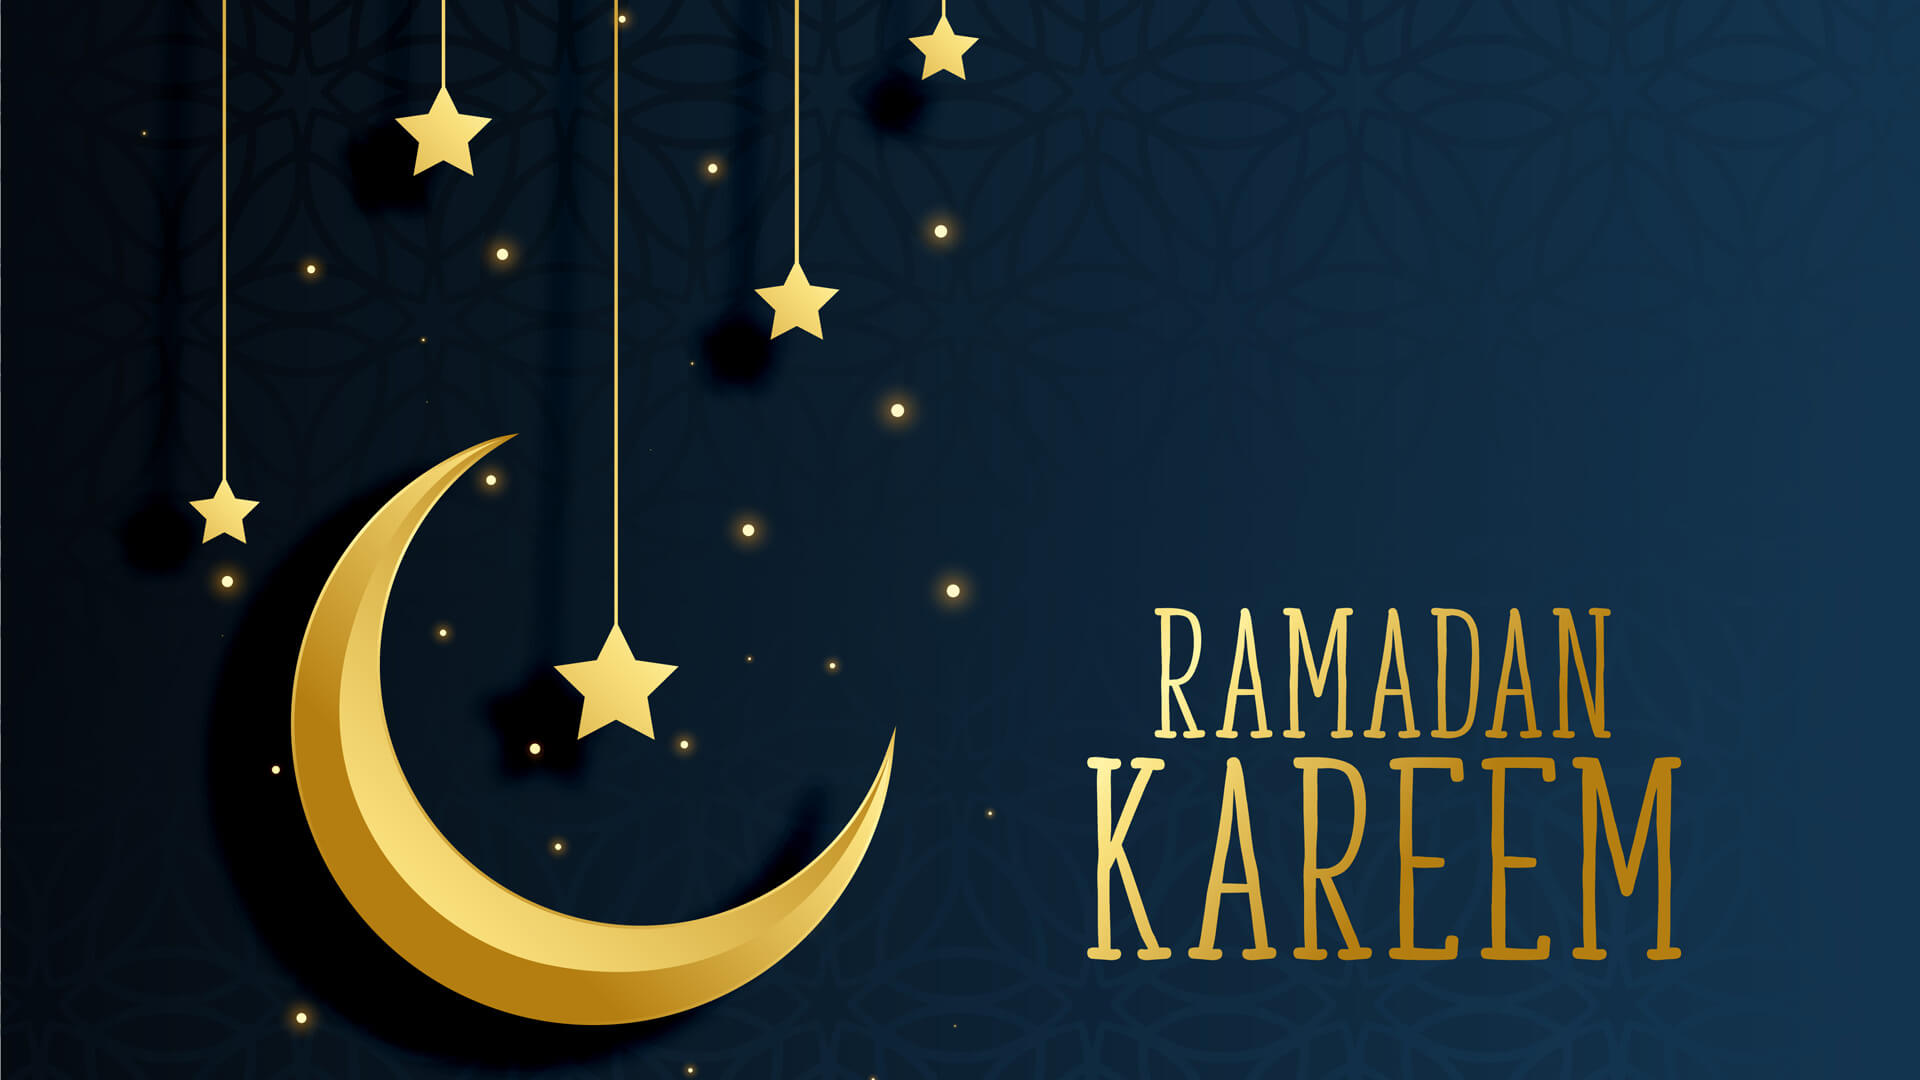 ramadan-kareem-2019-rwcl